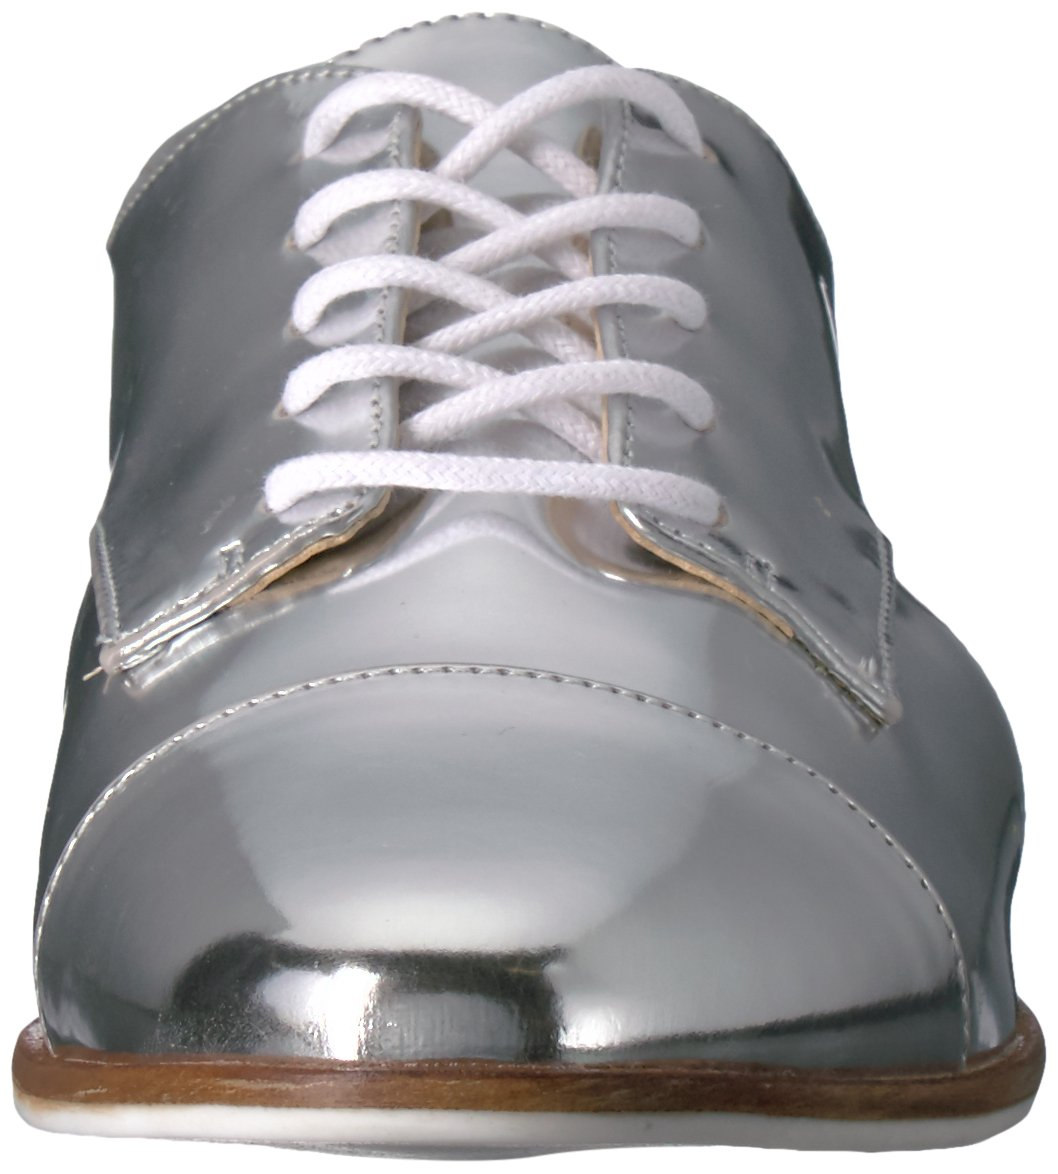 SCHUTZ Women's Gabry Boat Boat Boat shoes - Choose SZ color e316b5